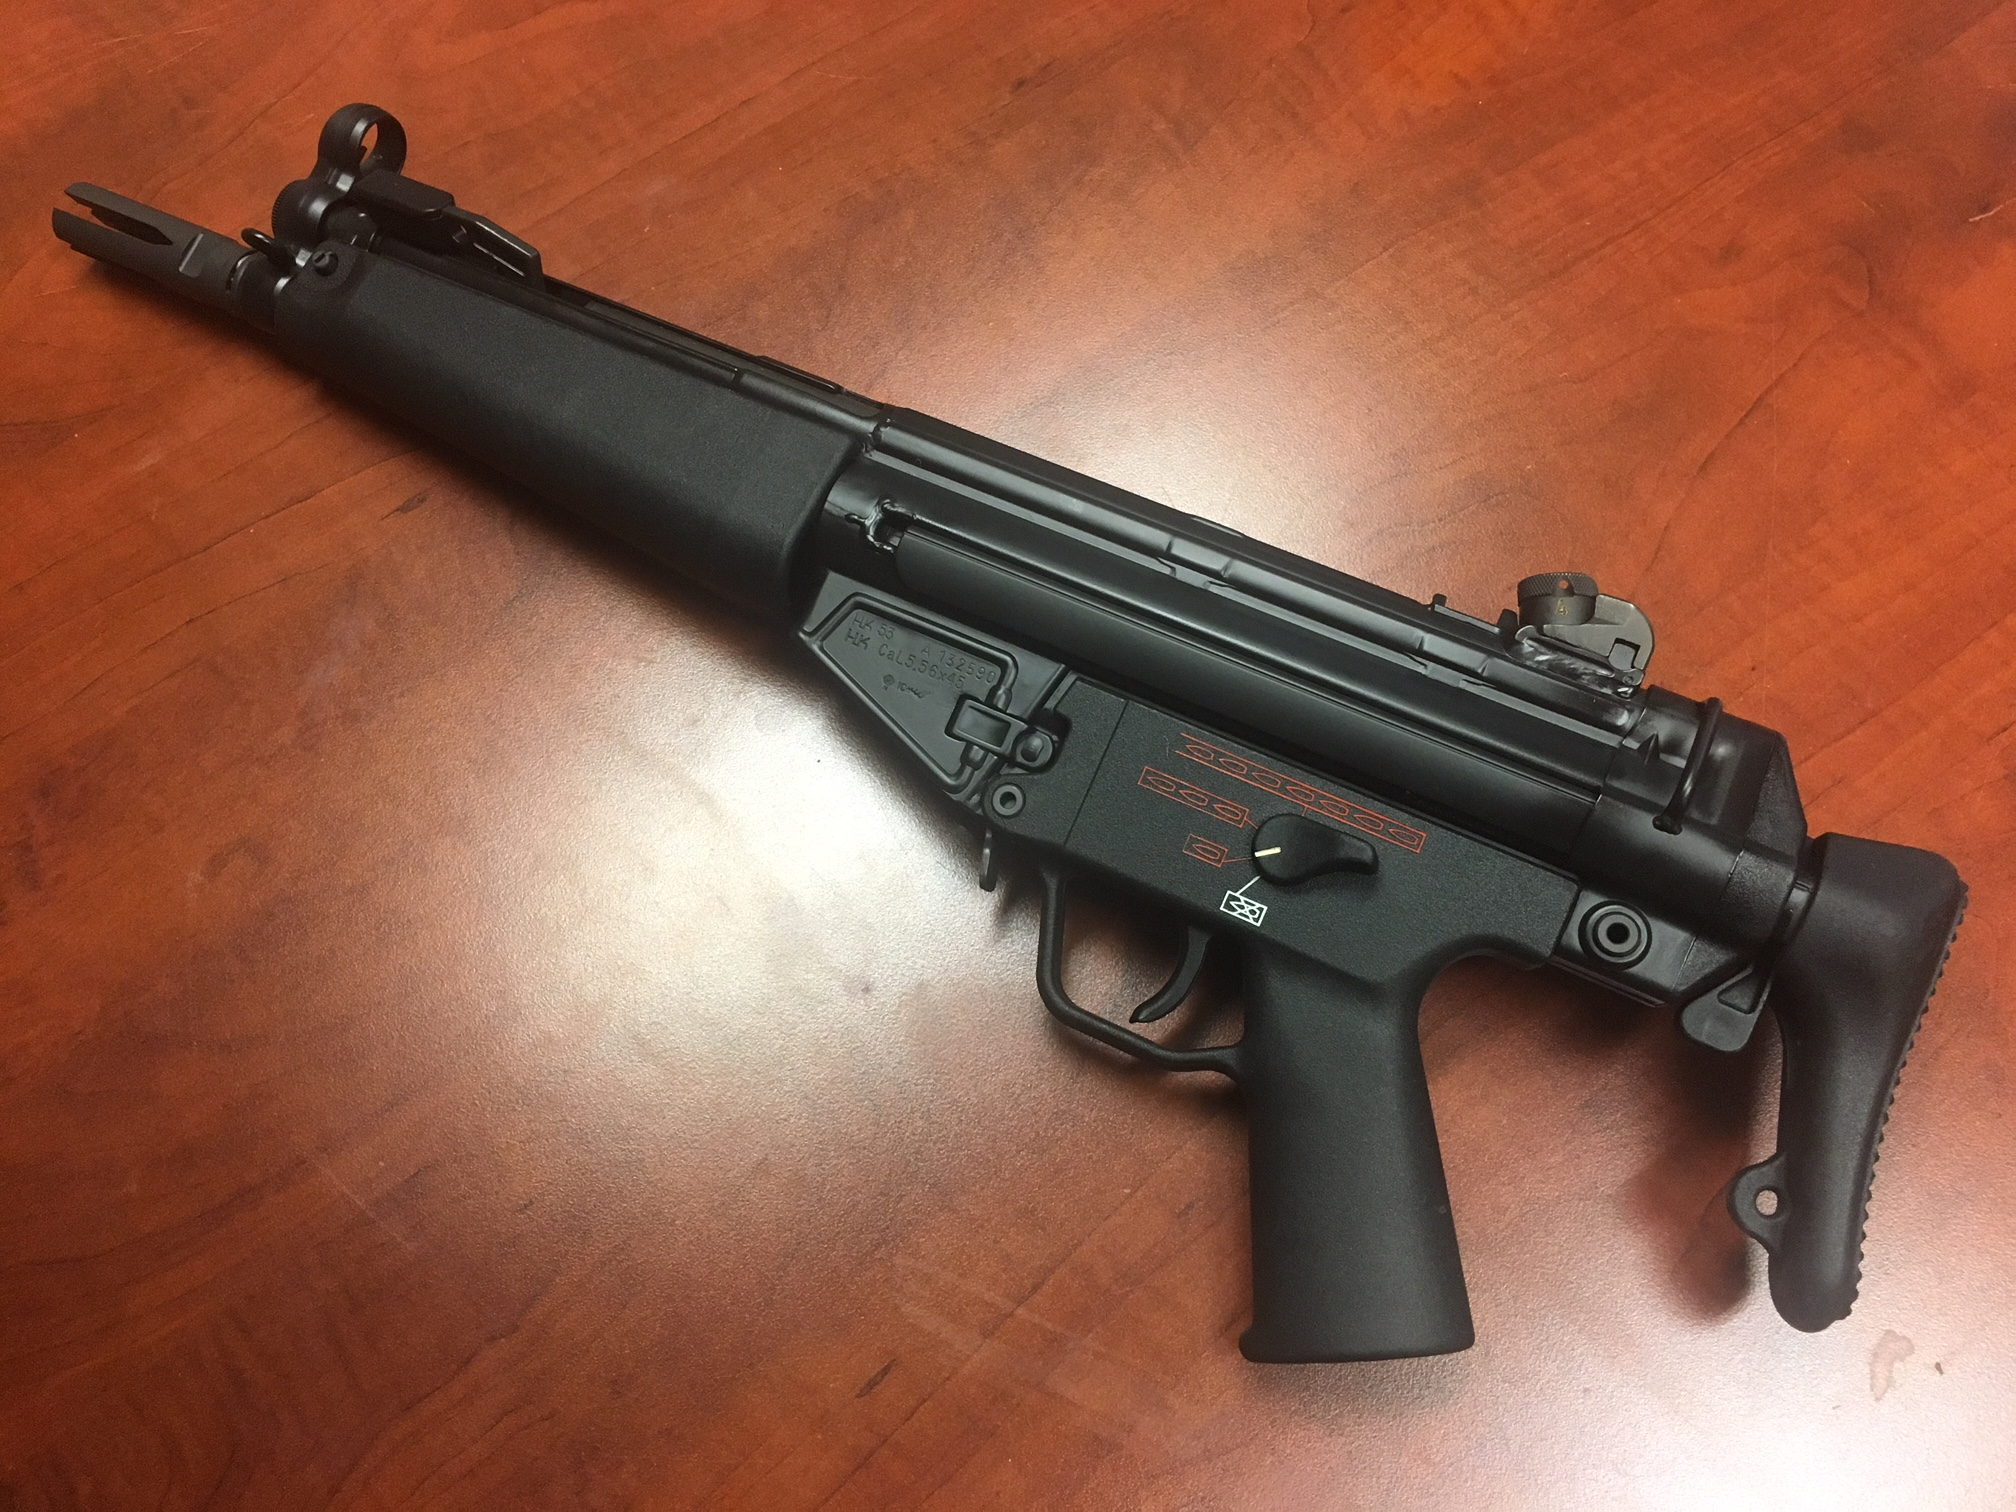 WTS: HK 53 by TSC Machine-53-1.jpg